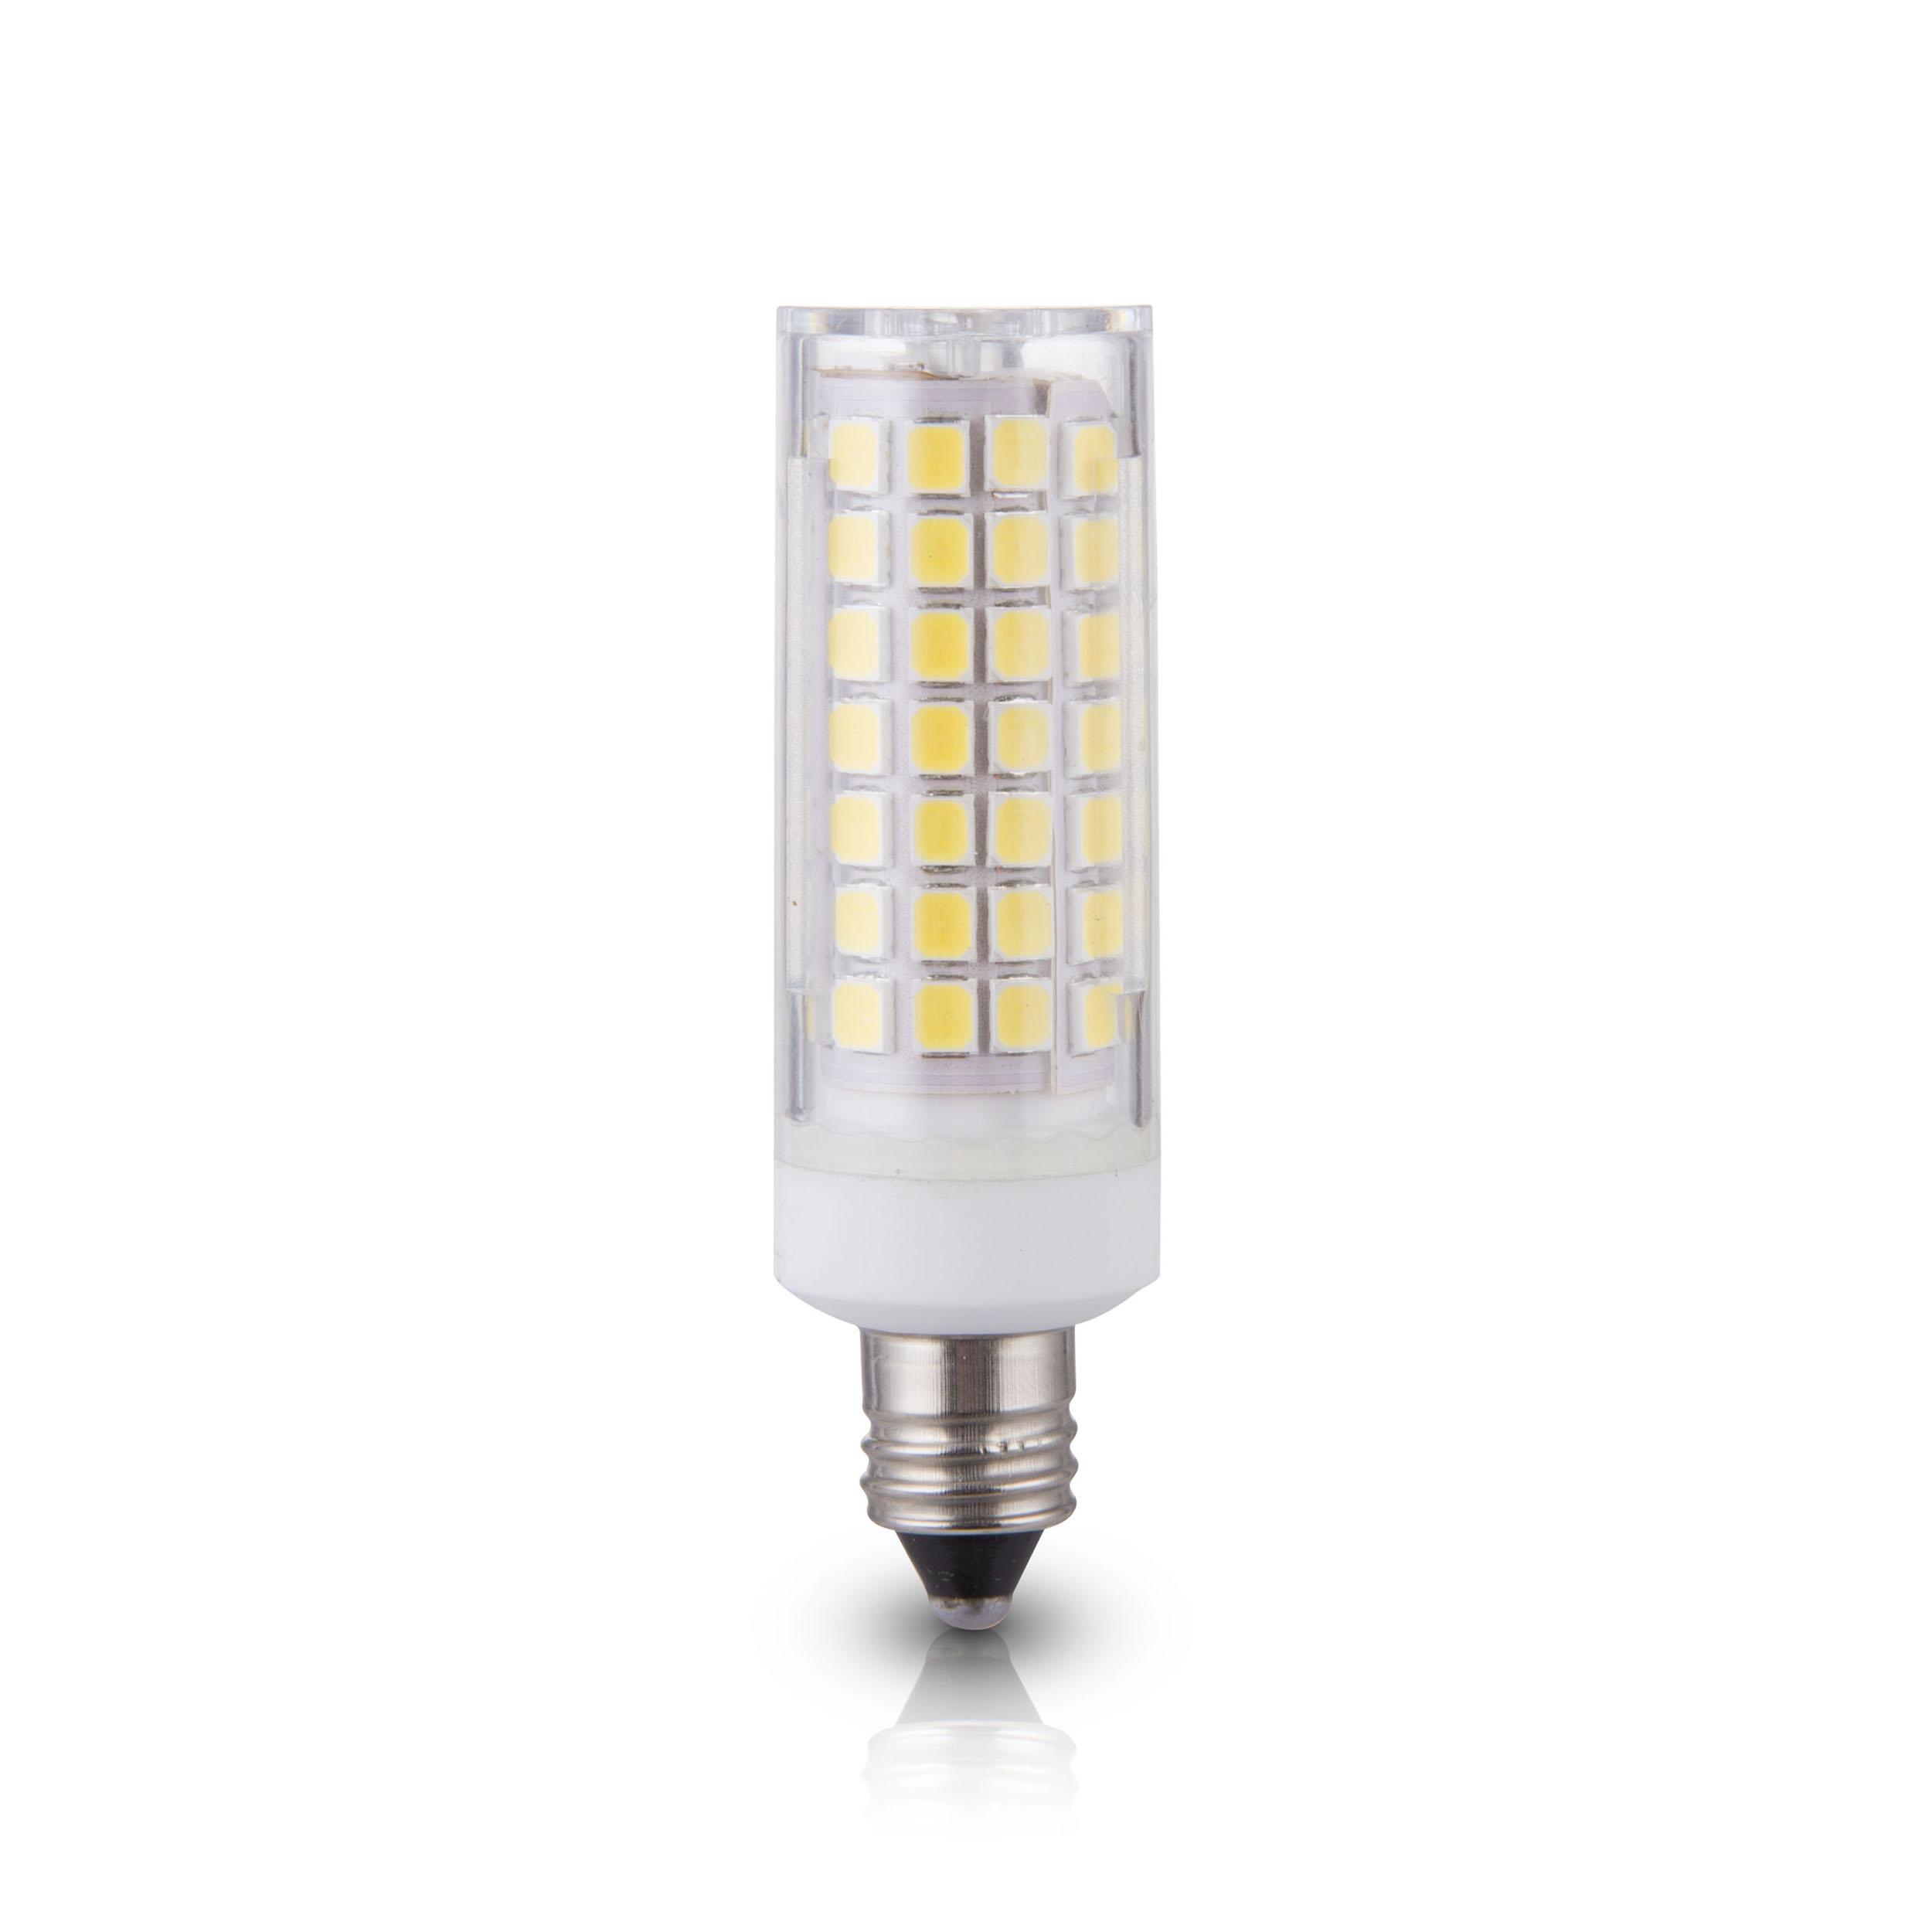 lumenbasic e11 led bulb mini candelabra base 50 watt to 60 watt incadescent bulb replacement. Black Bedroom Furniture Sets. Home Design Ideas